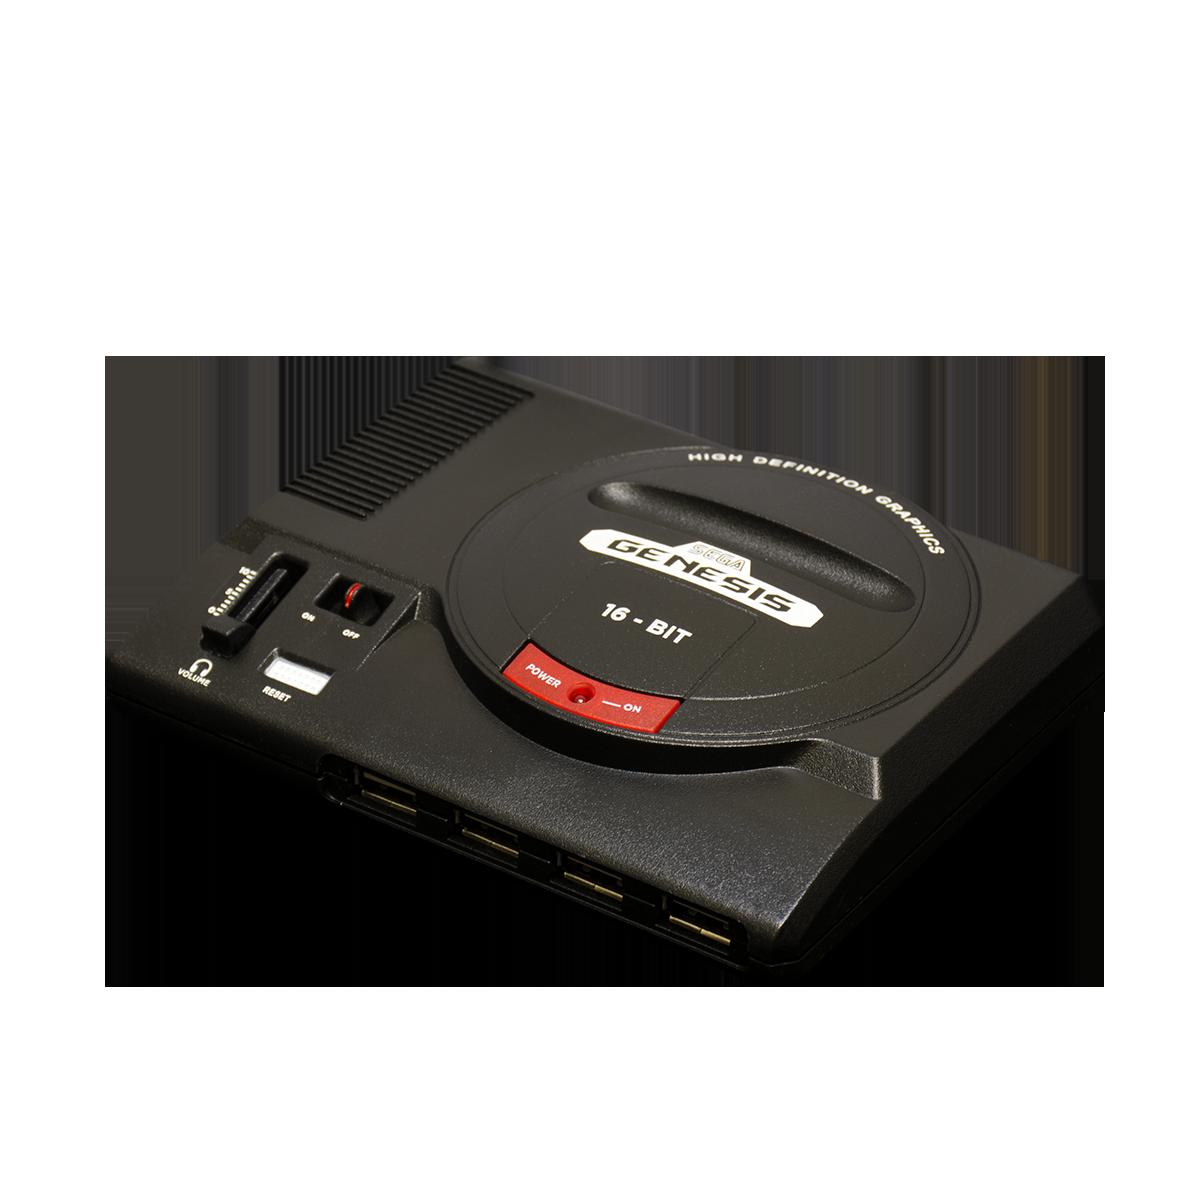 Sega Genesis Usb Hub Usb Hub Sega Genesis Usb